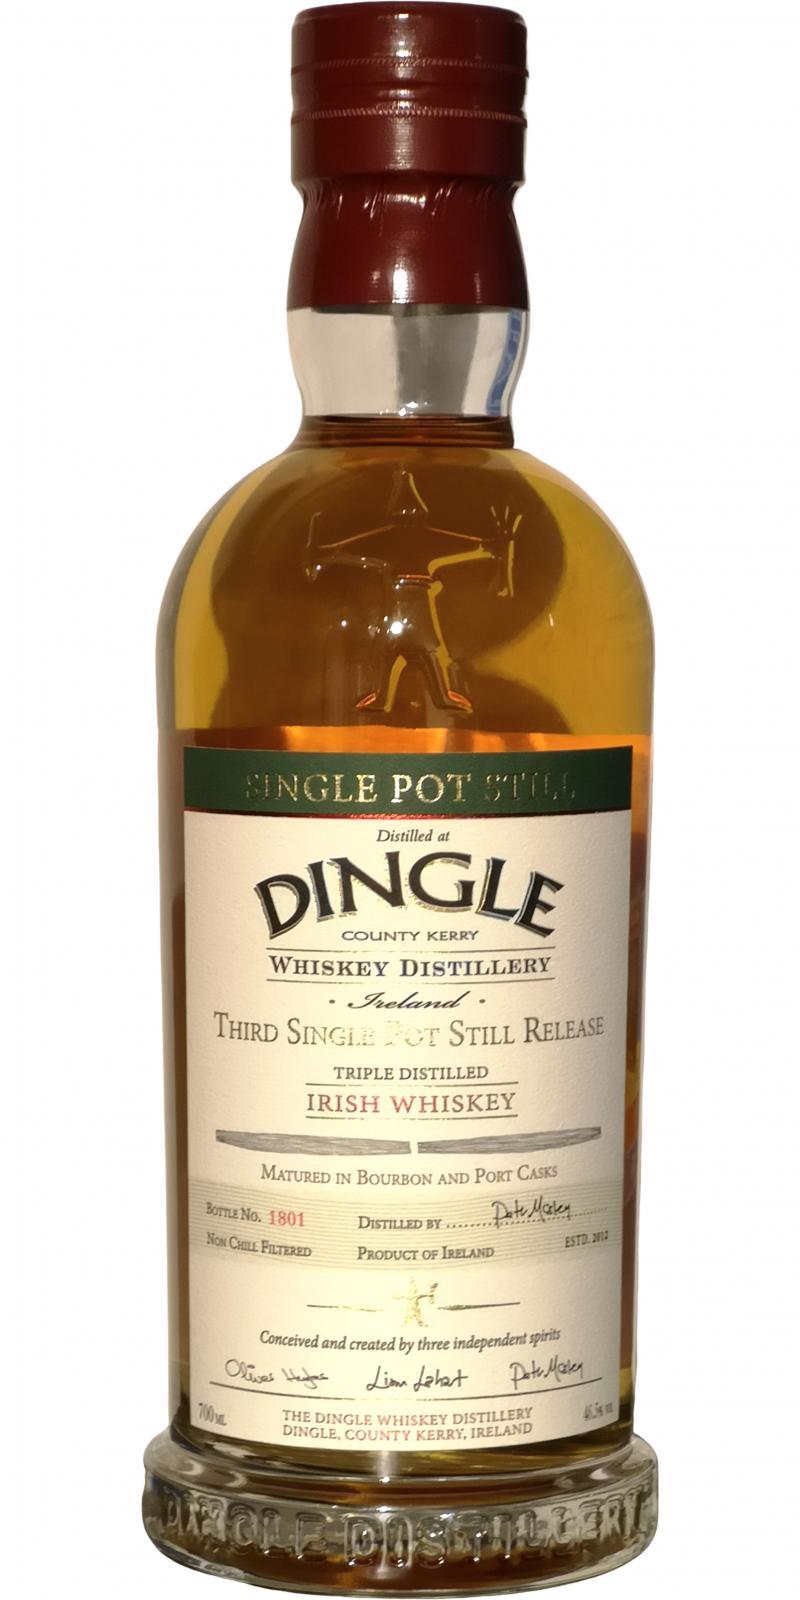 Dingle Third Single Pot Still Release